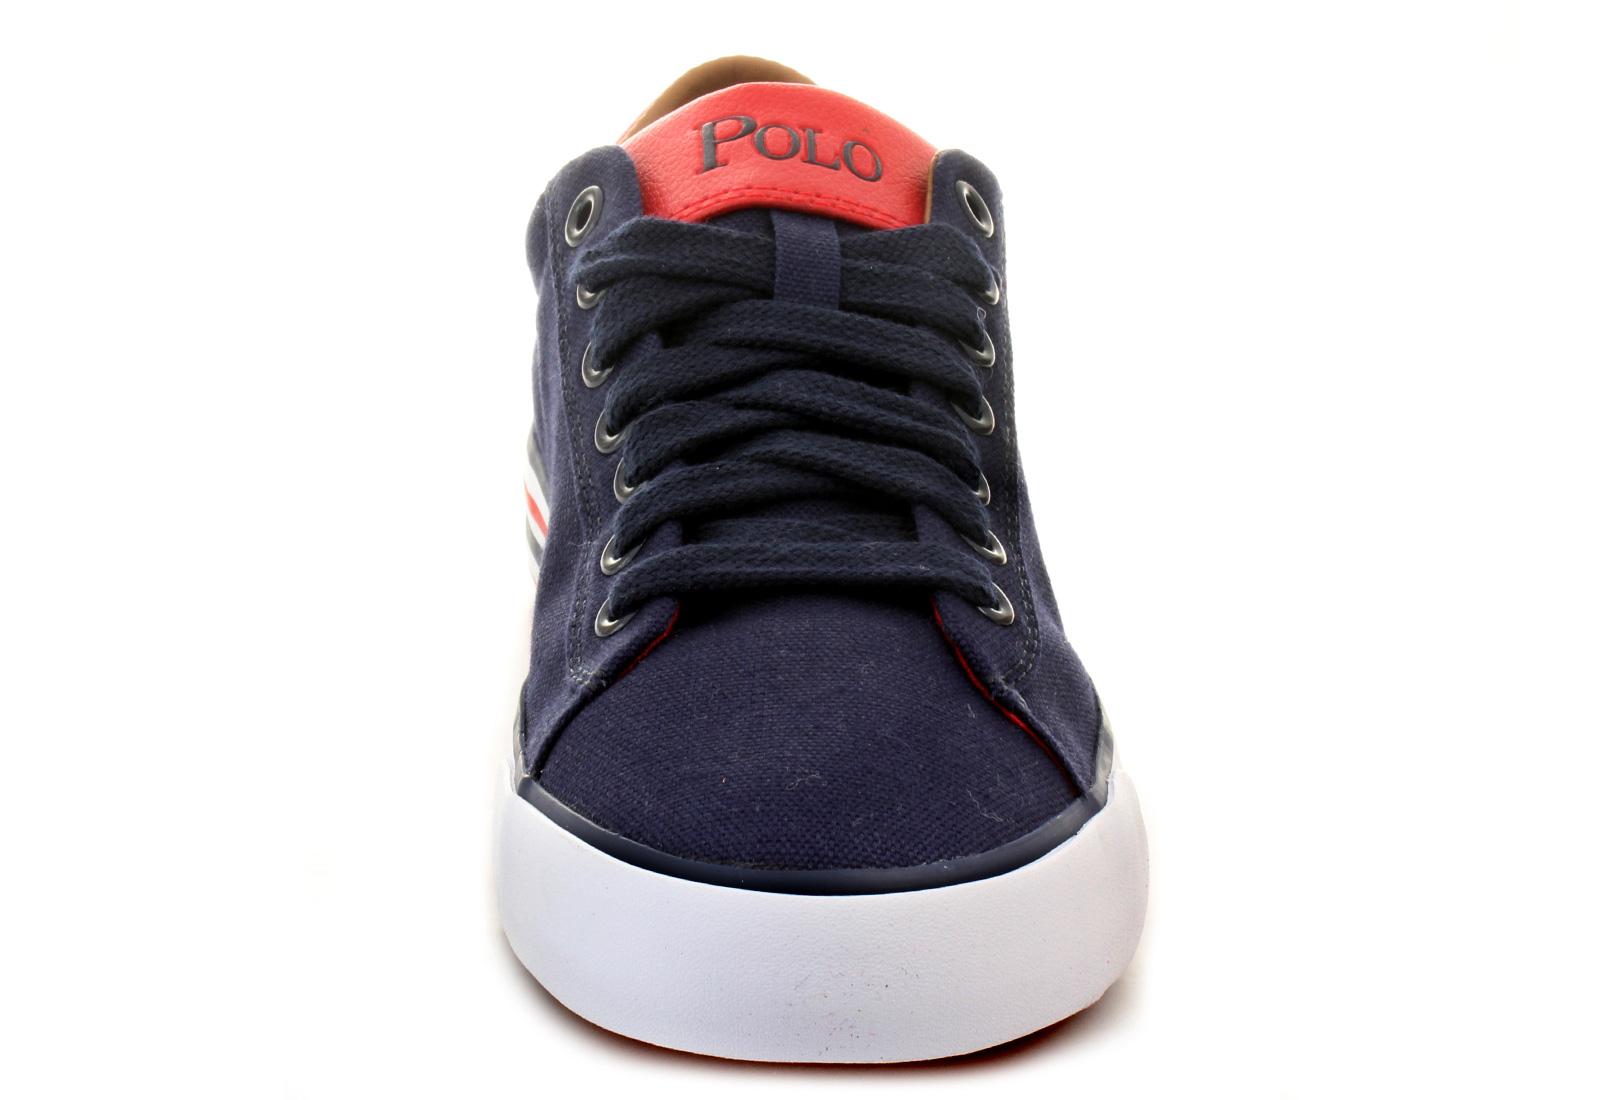 Polo Ralph Lauren Cipő - Harvey - Ne - 8161907580GB - Office Shoes ... 892f9f8f77